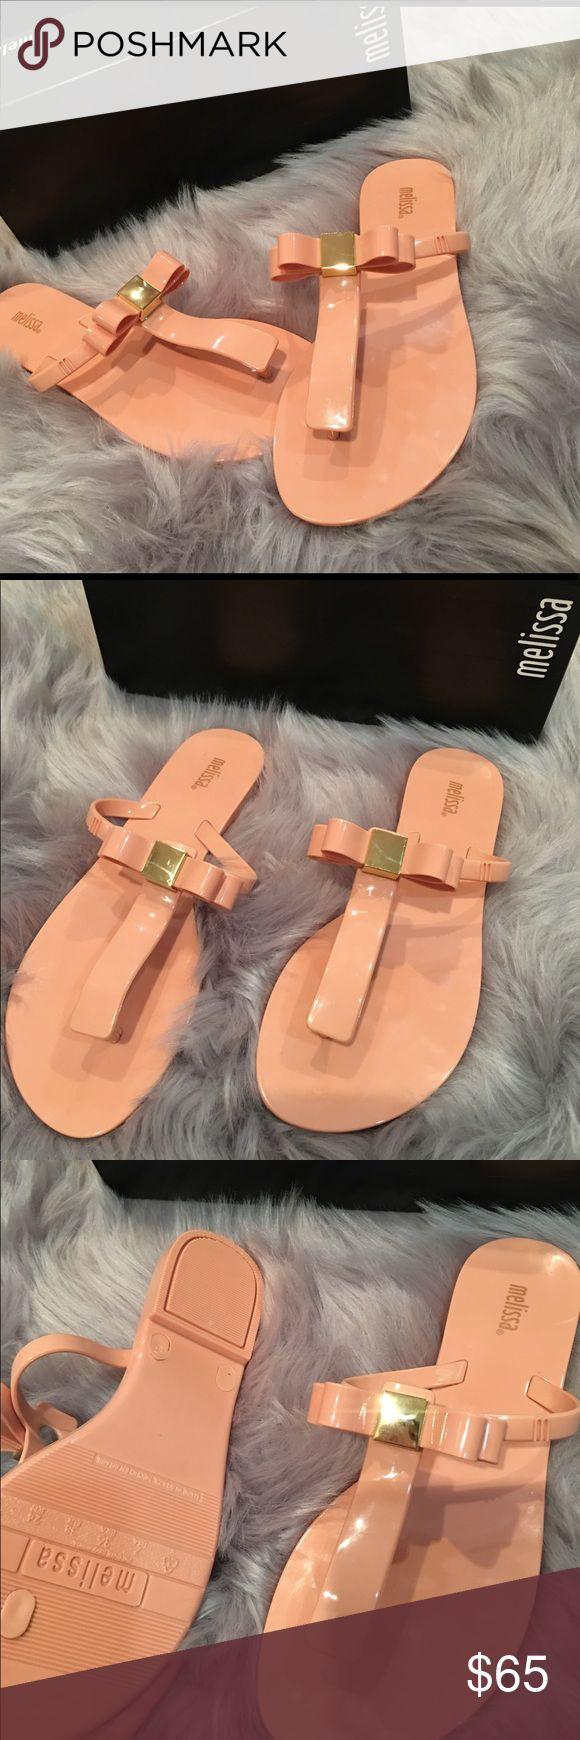 🚨sale🚨Melissa Flip Flop Jelly Pink sandal shoe Melissa Women s T Bar Iv Flip Flop Pale Pink Blush Nude Size 7 Bow Gold Melissa Shoes Slippers